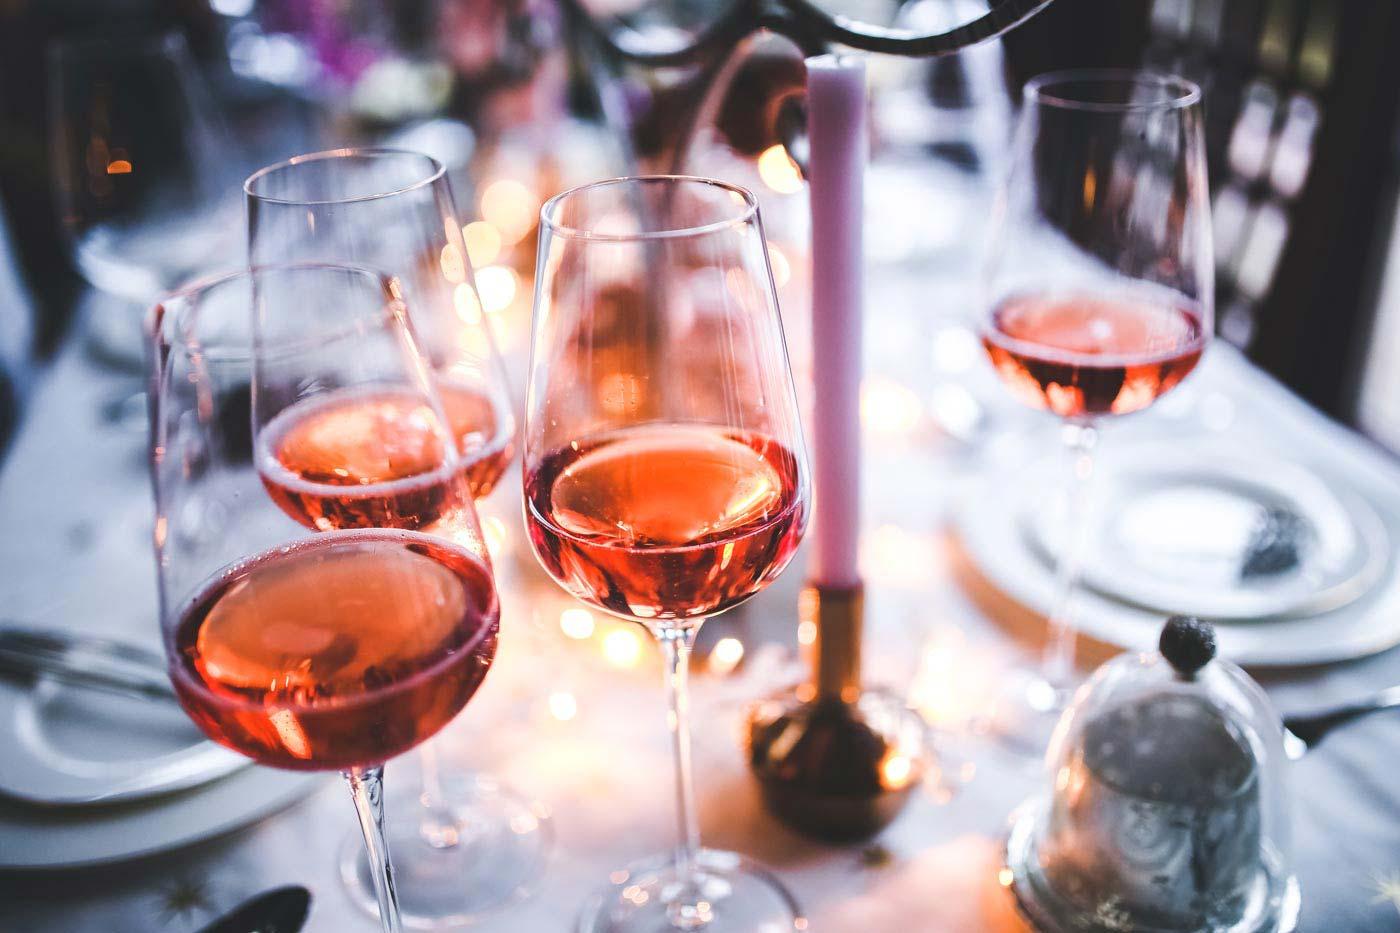 Corfu weddings venue, dominoes ipsos dassia corfu, special occasions, events, weddings in corfu,